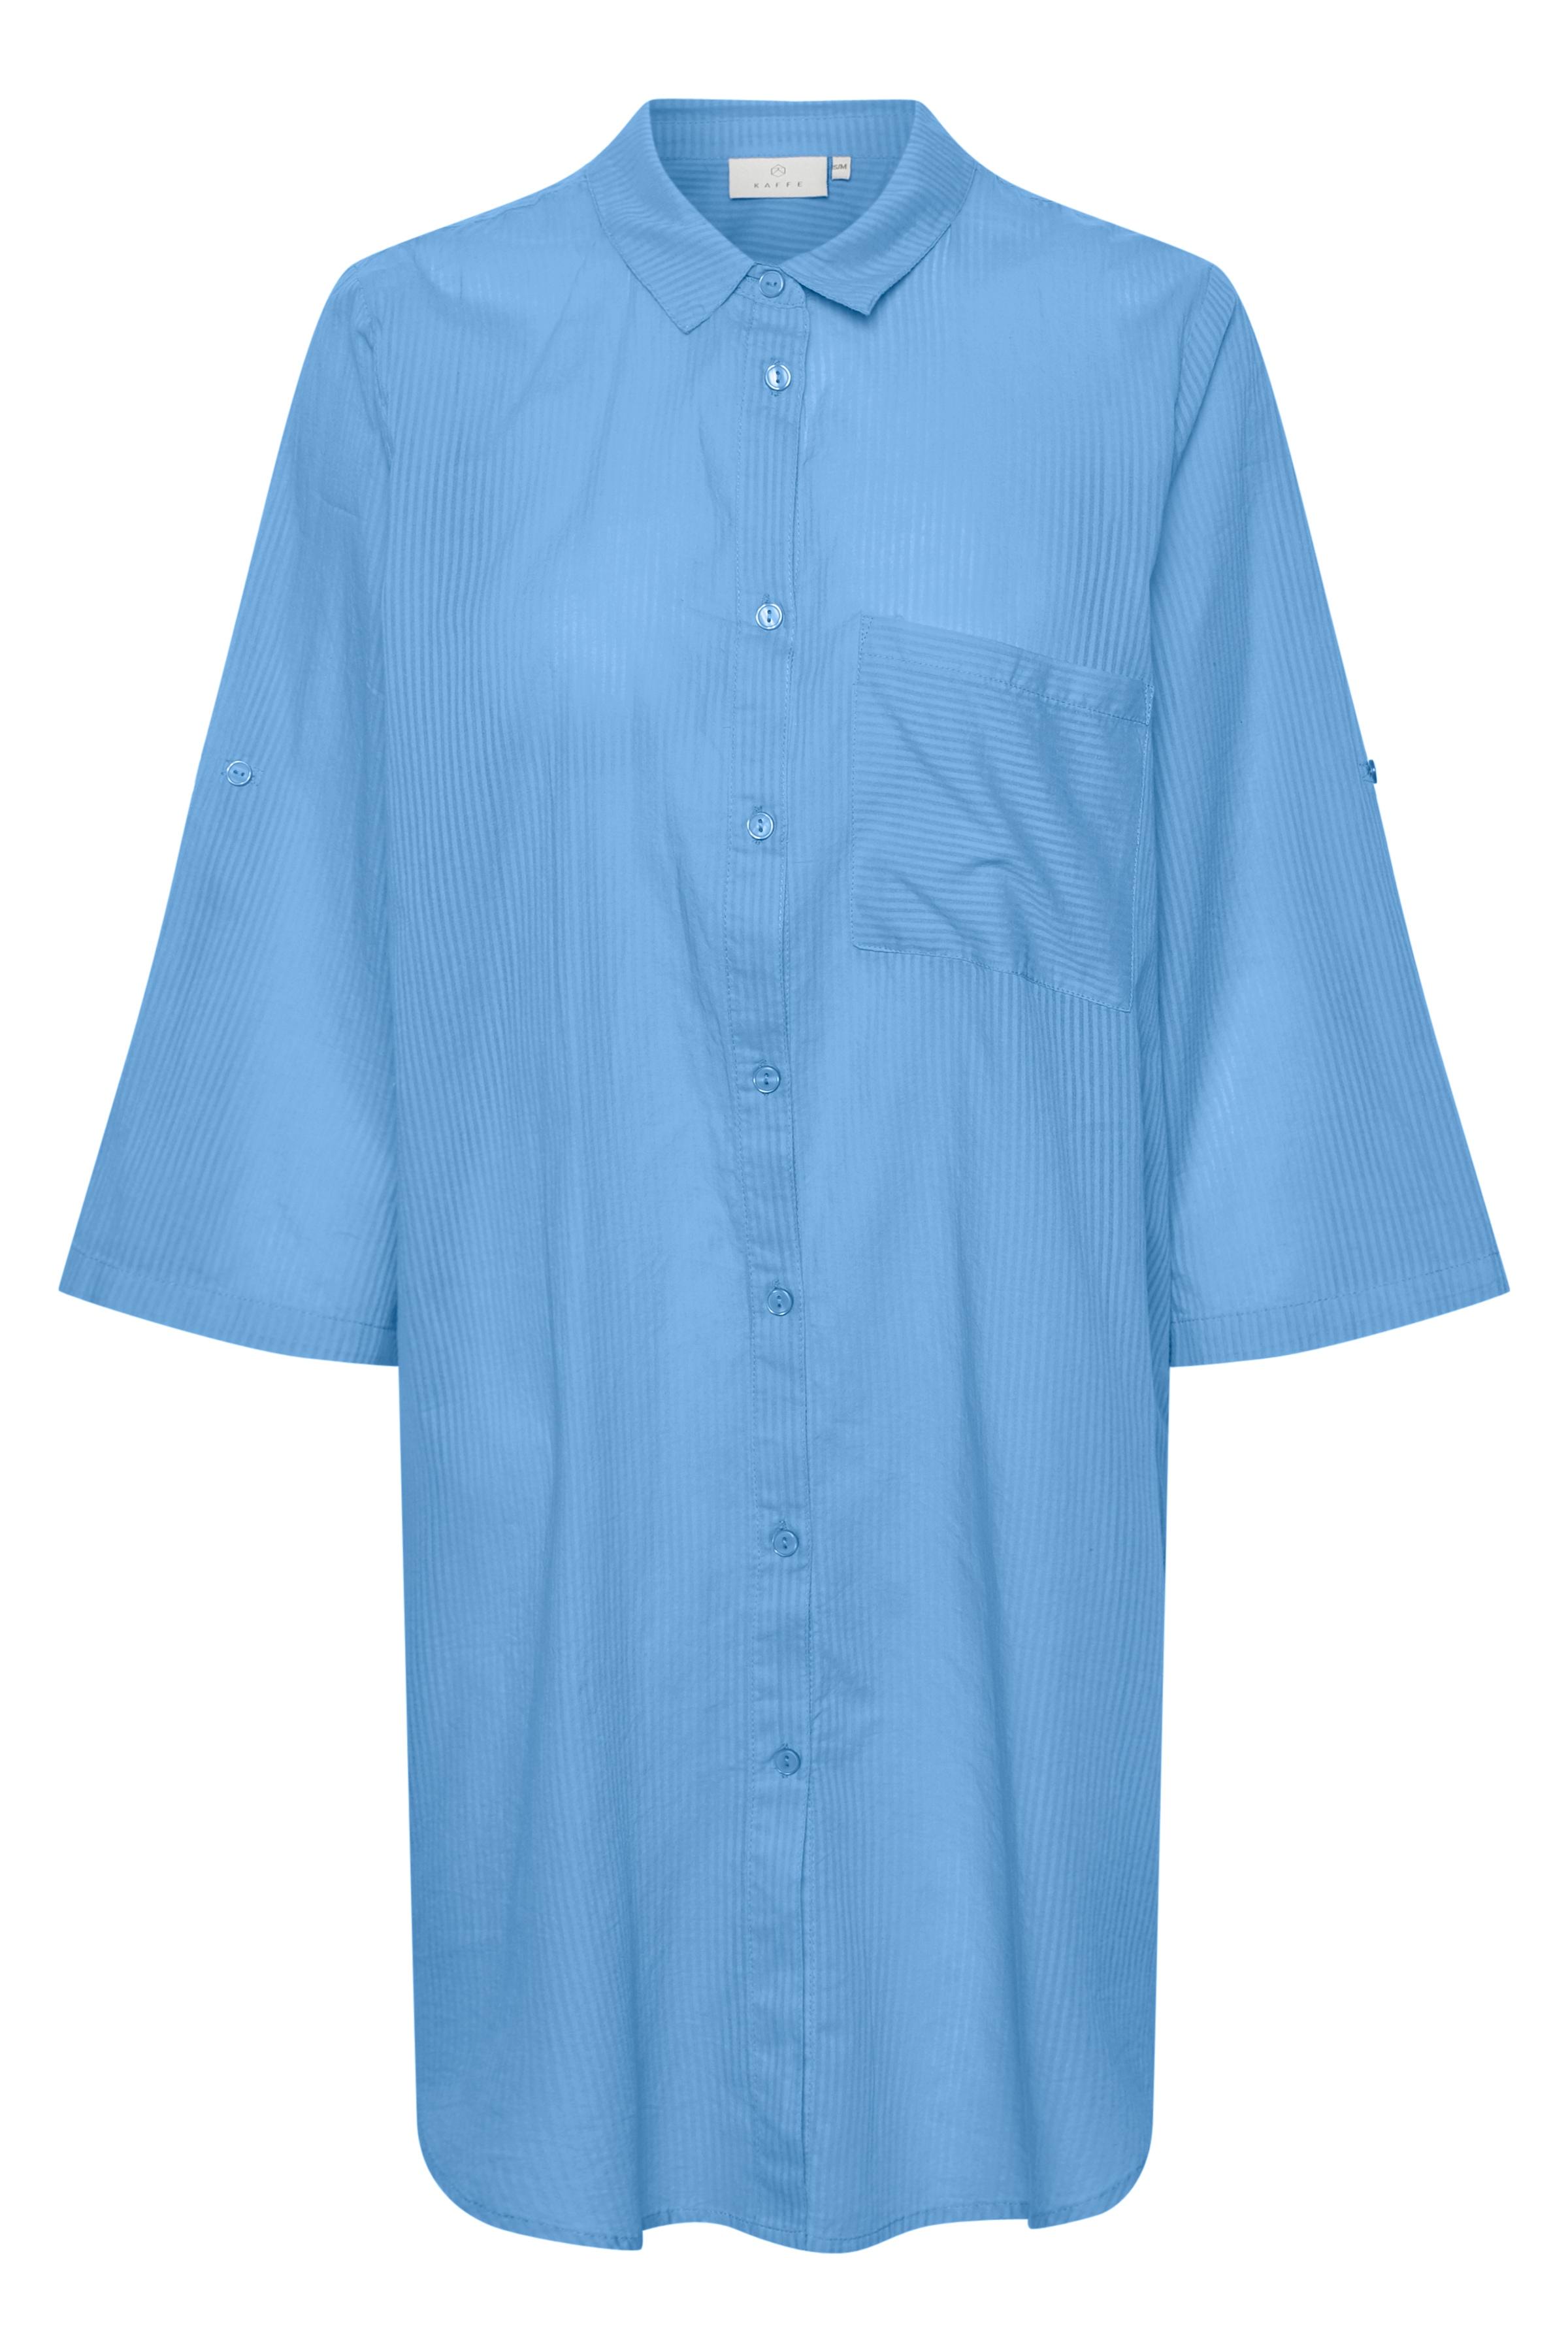 kaffe -  Hemdblusenkleid KArona Shirt